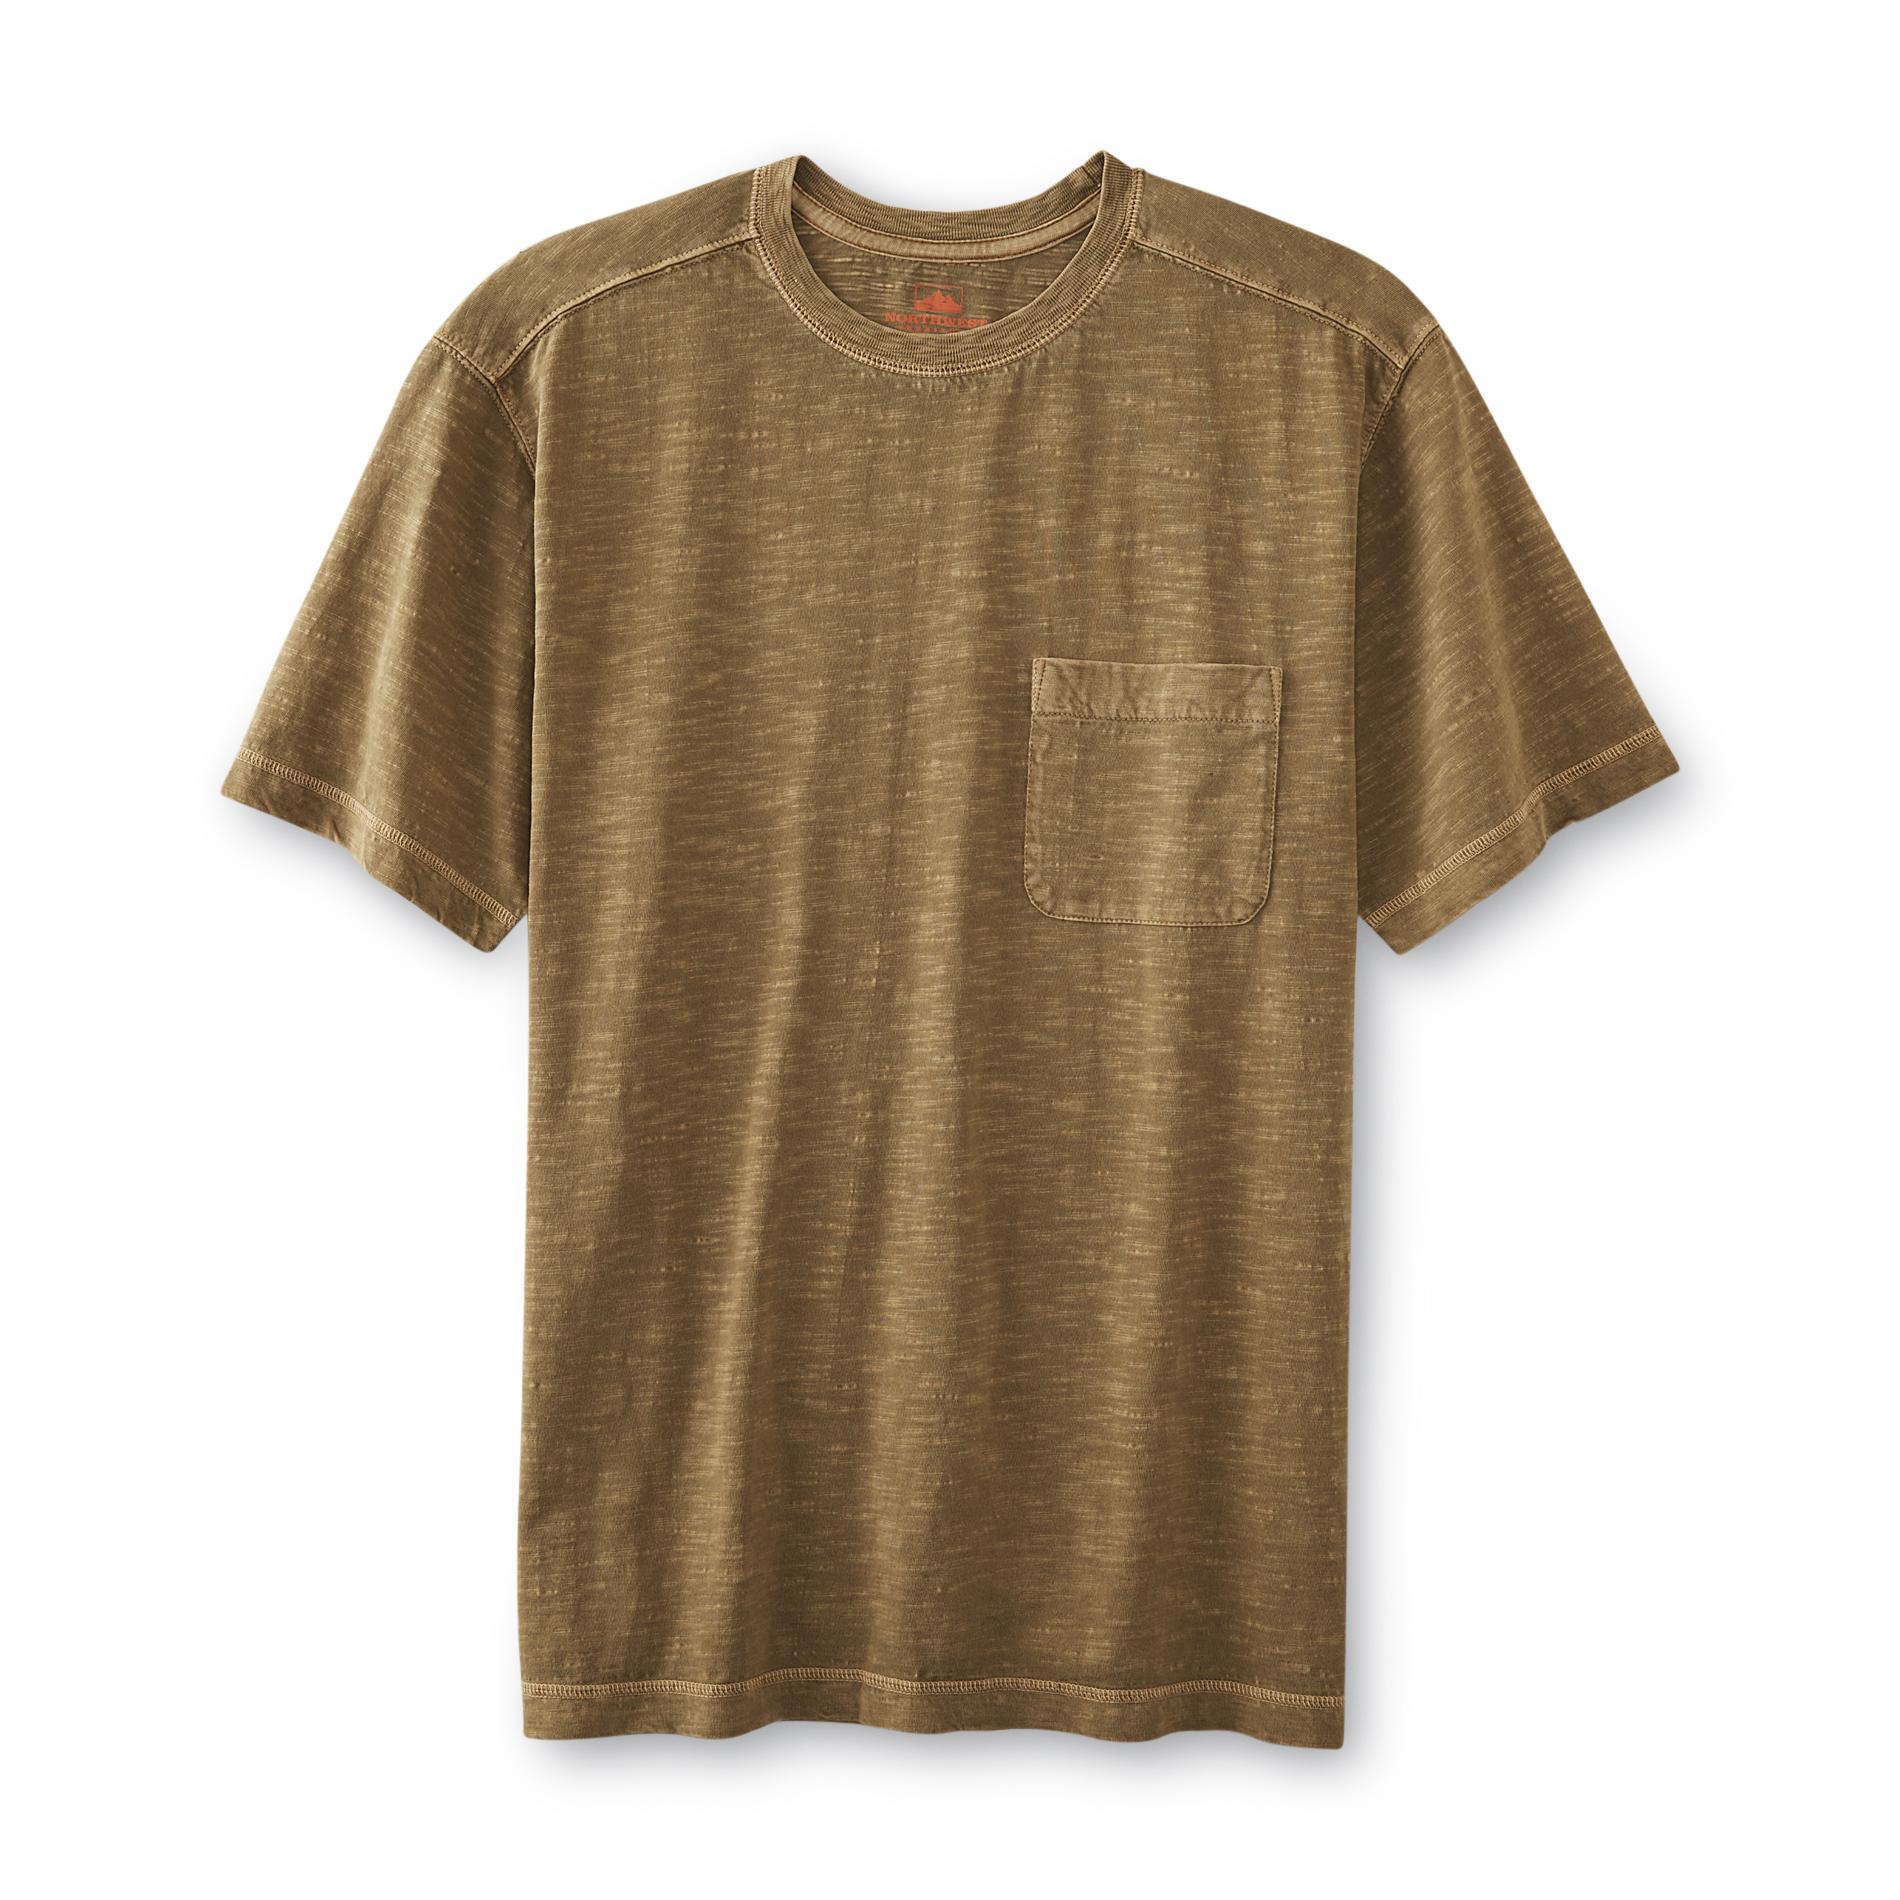 95a5f5b259 Northwest Territory Men s Big   Tall Pocket T-Shirt